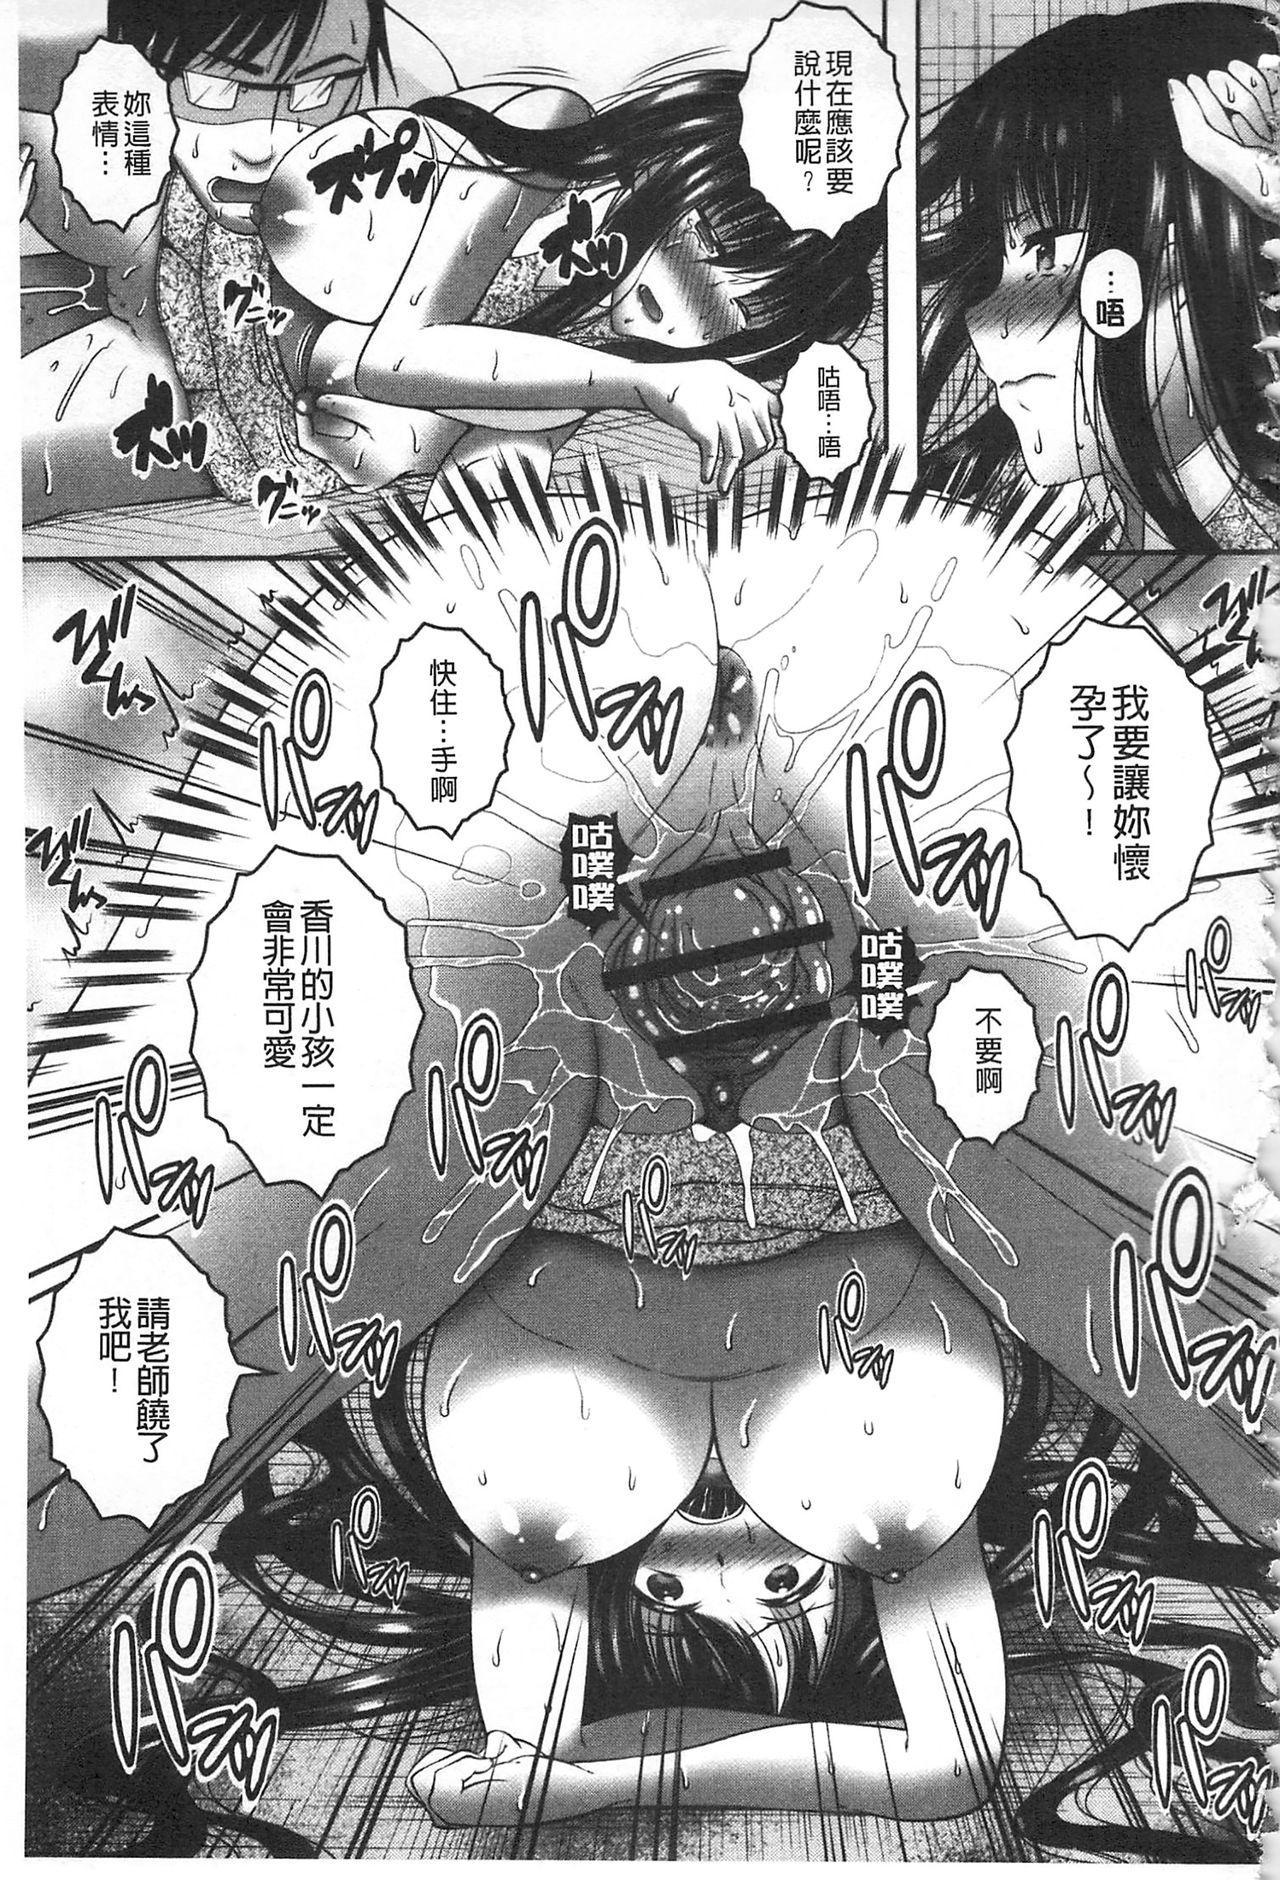 Kanjuku Otome no Odoshikata | 姦熟乙女的脅迫法 186